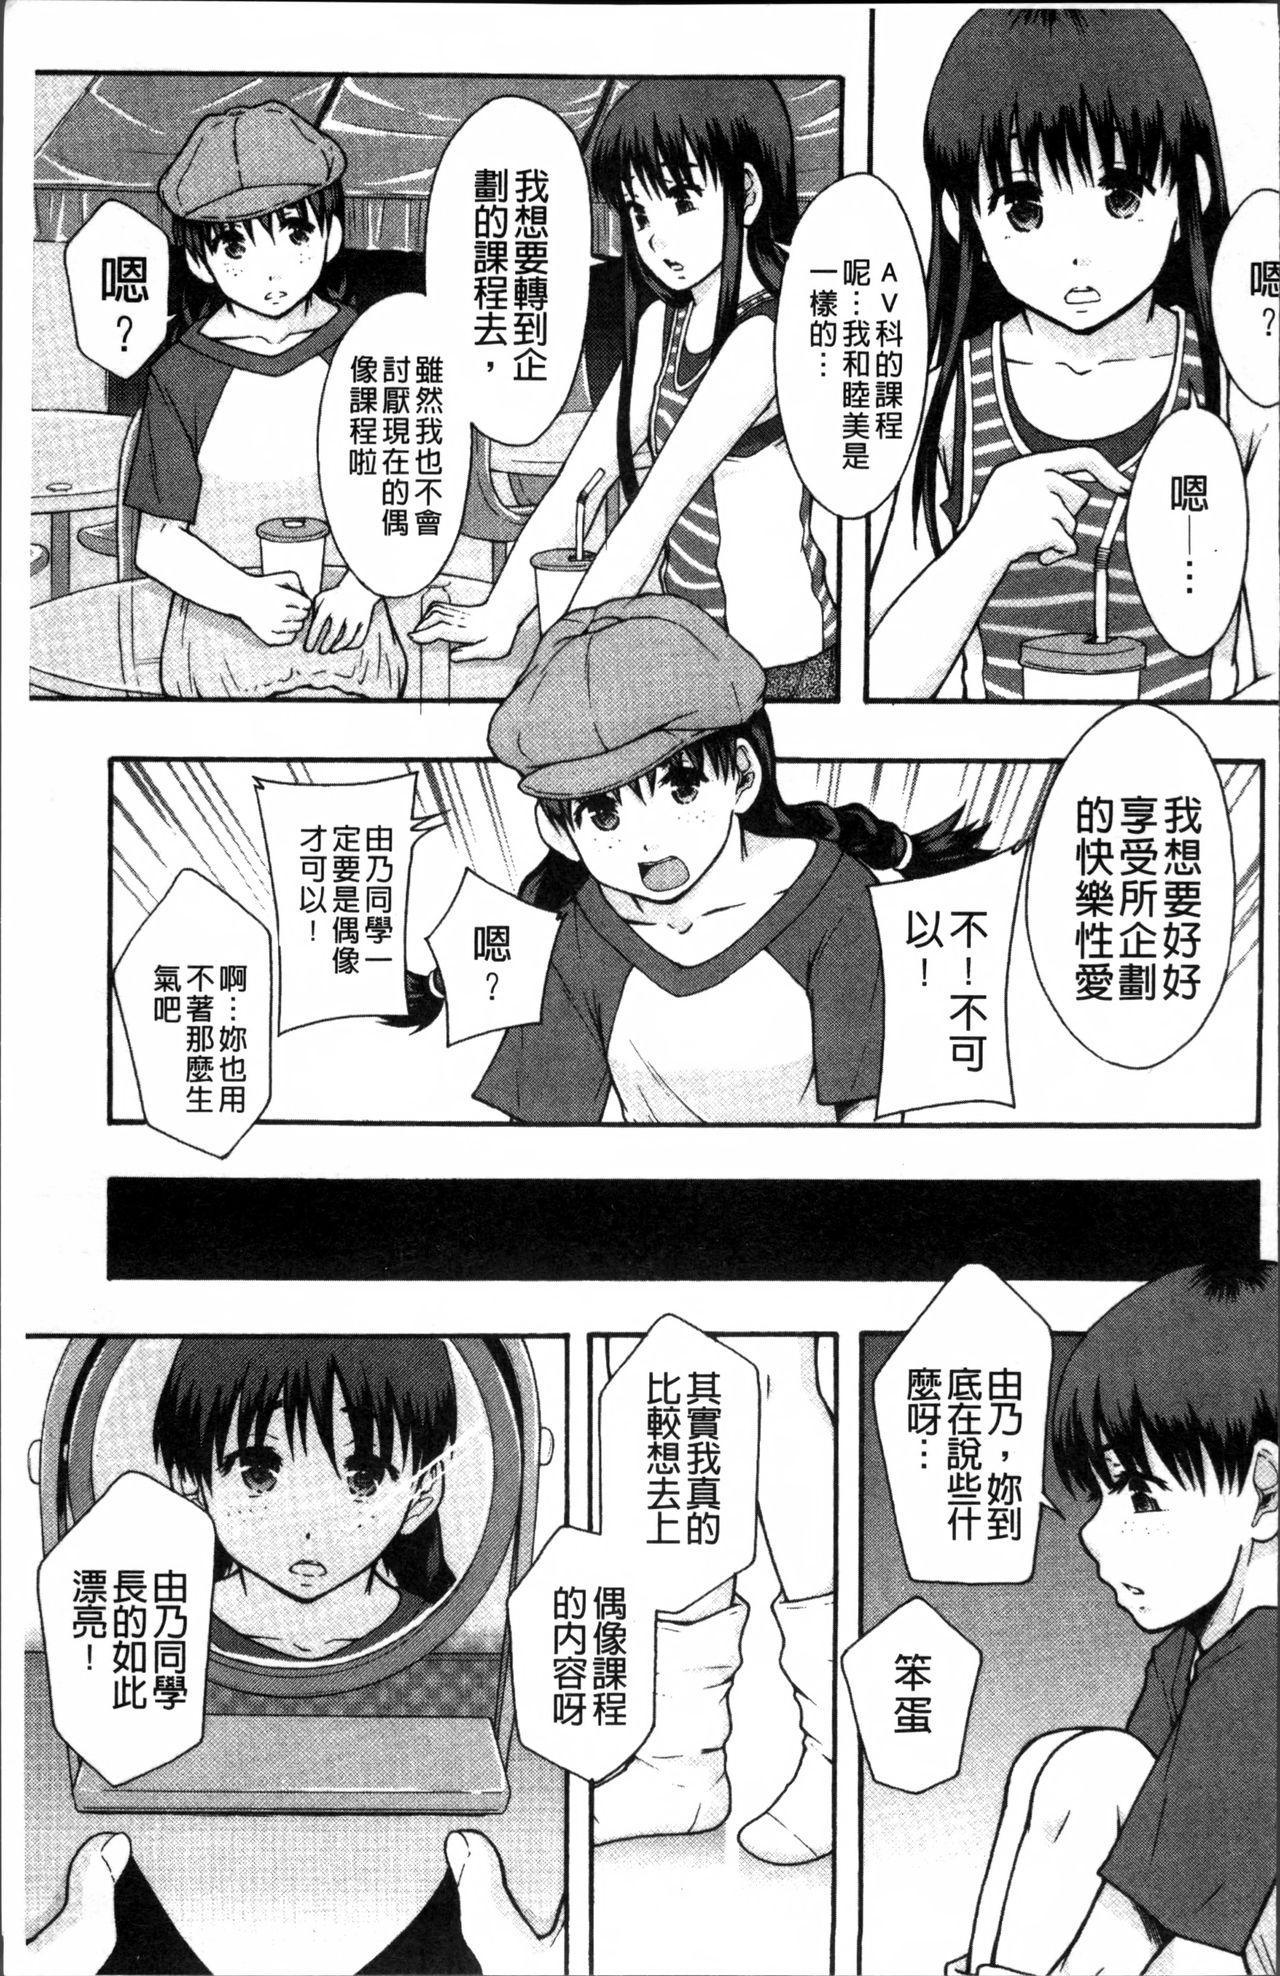 Anoko no Class wa AV-ka 99